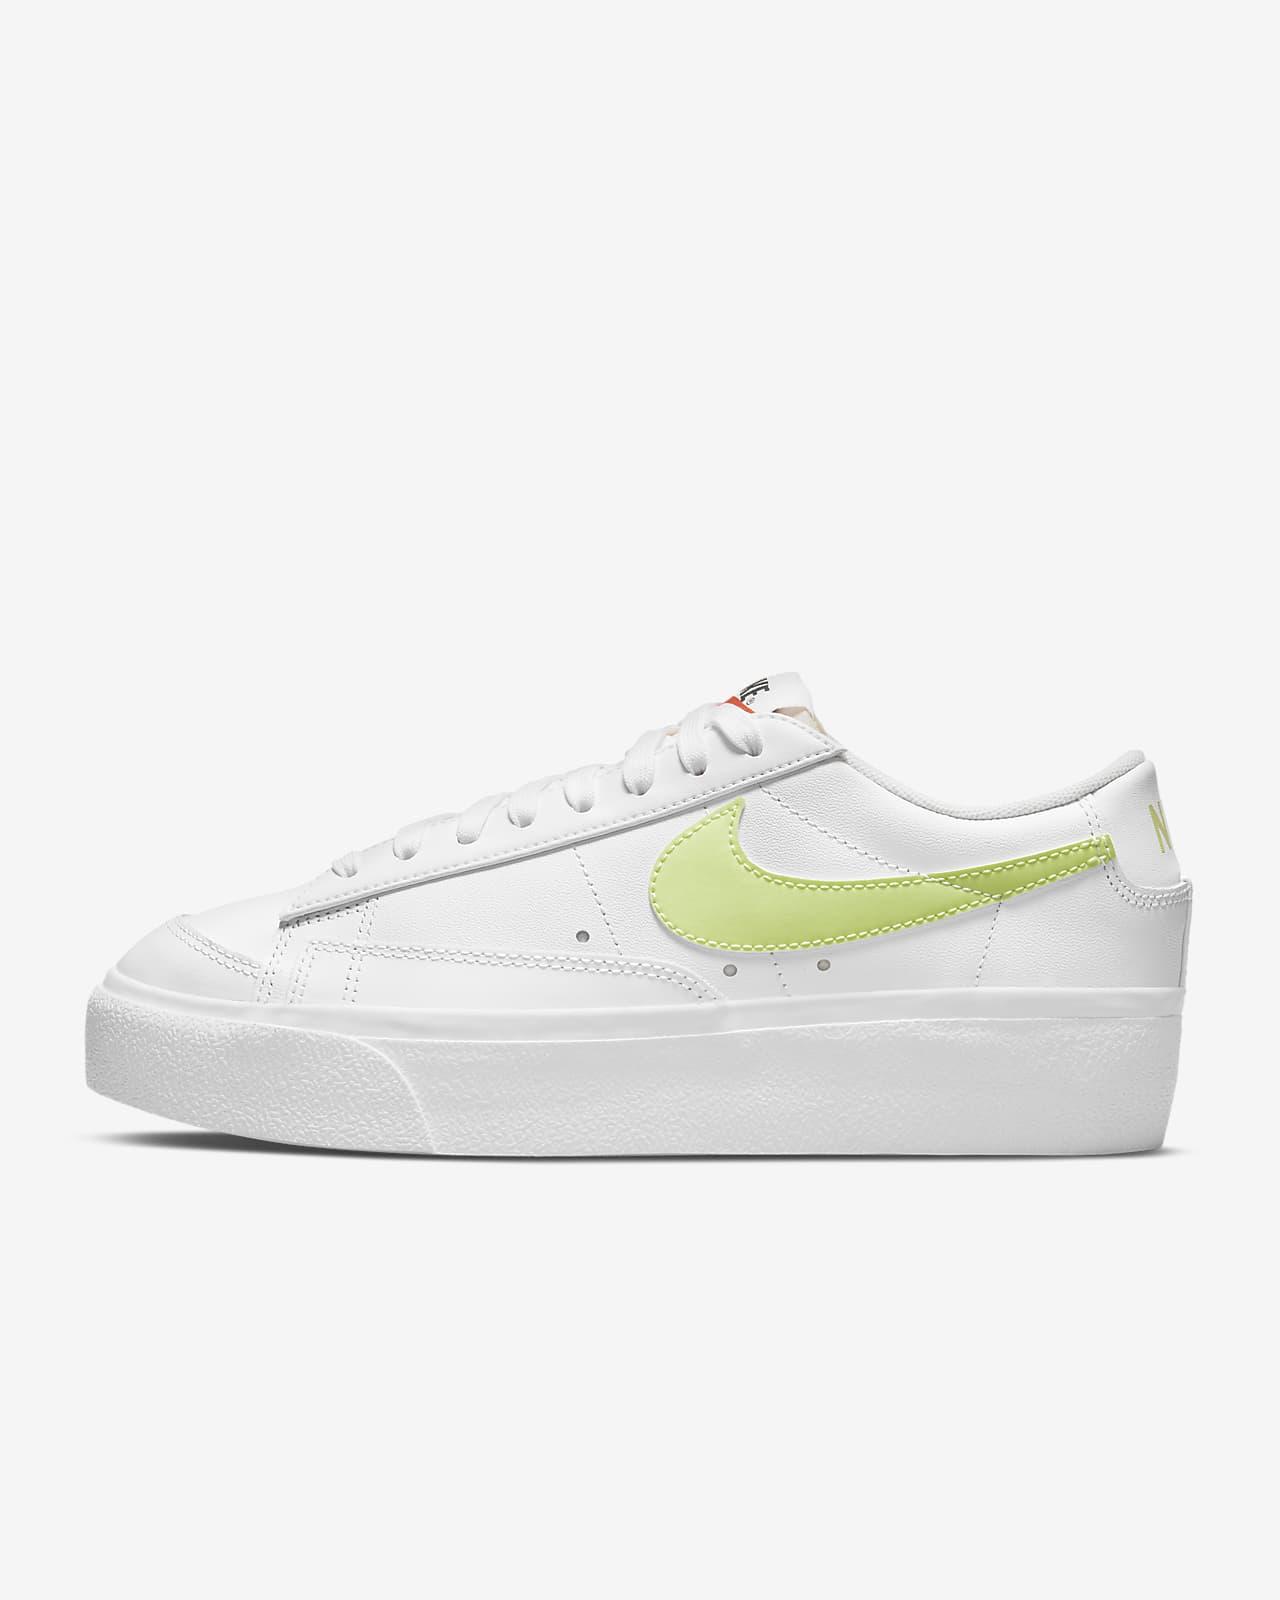 Nike Blazer Low Platform Women's Shoes